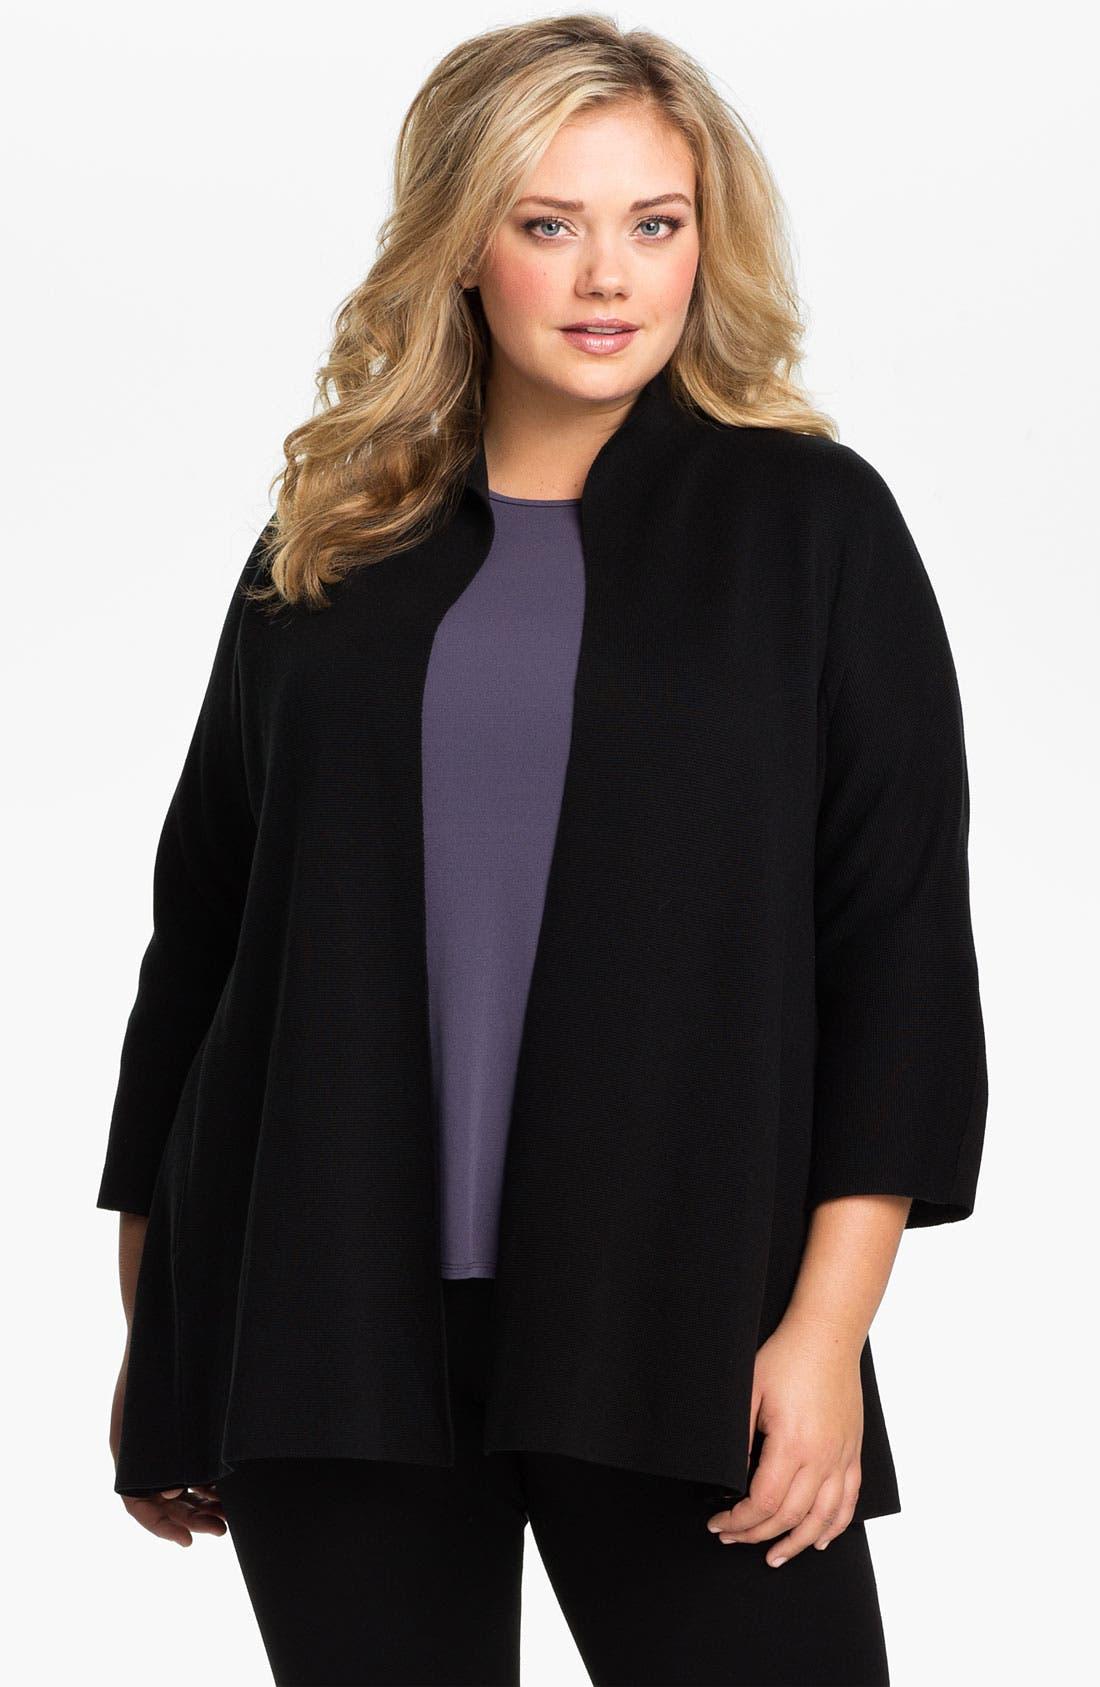 Alternate Image 1 Selected - Eileen Fisher Silk Blend Knit Jacket (Plus)